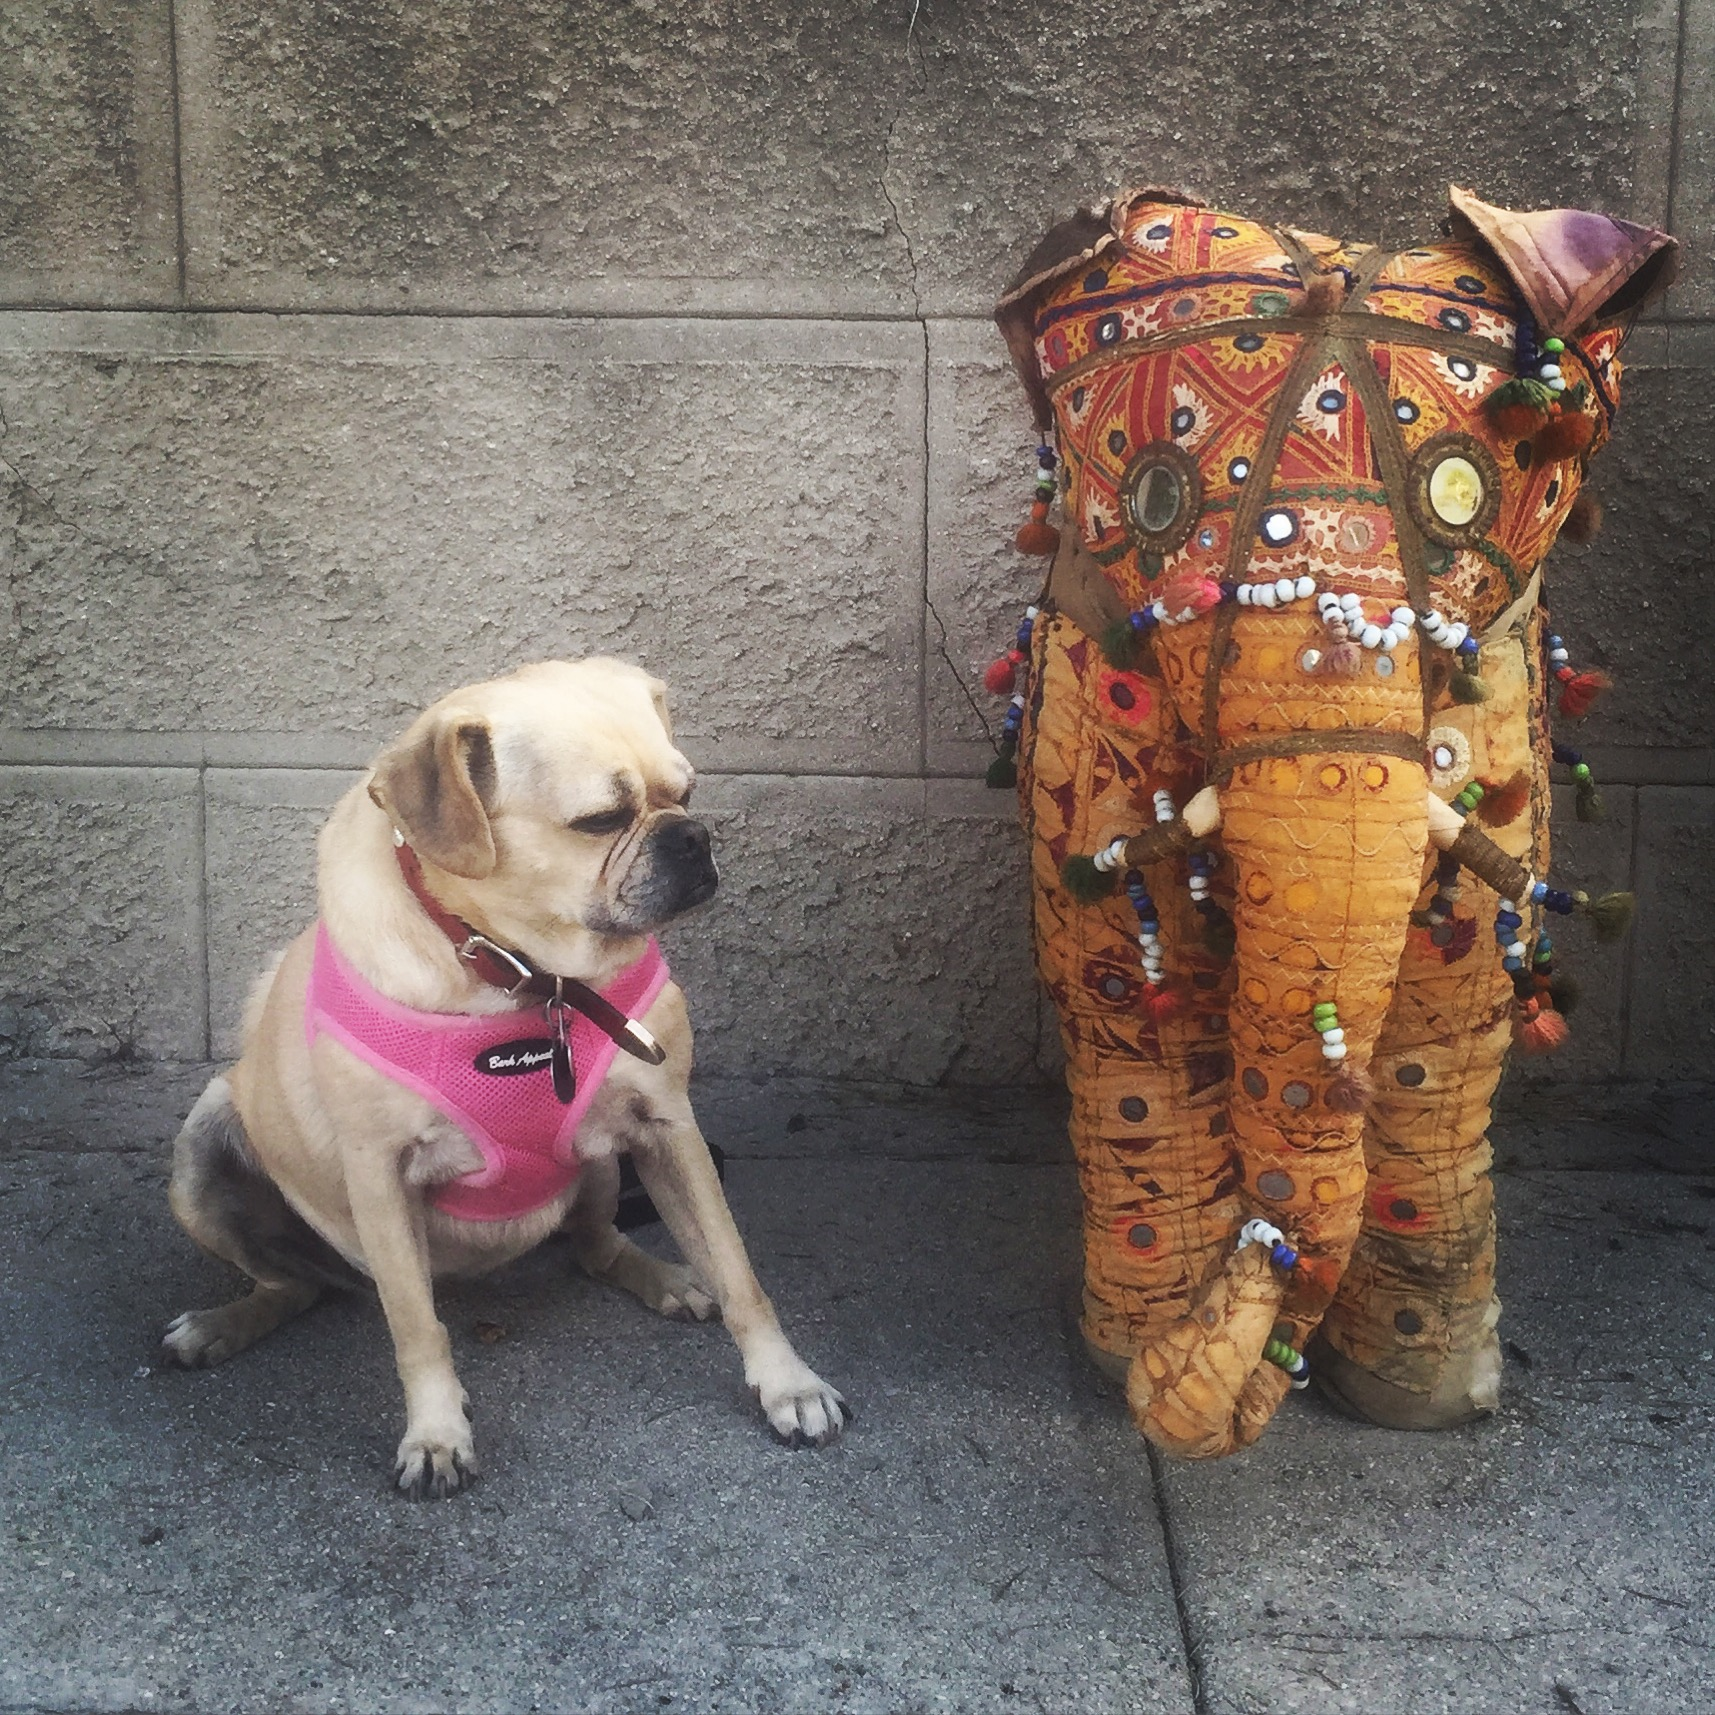 Elephant Puggle (LA 2015)